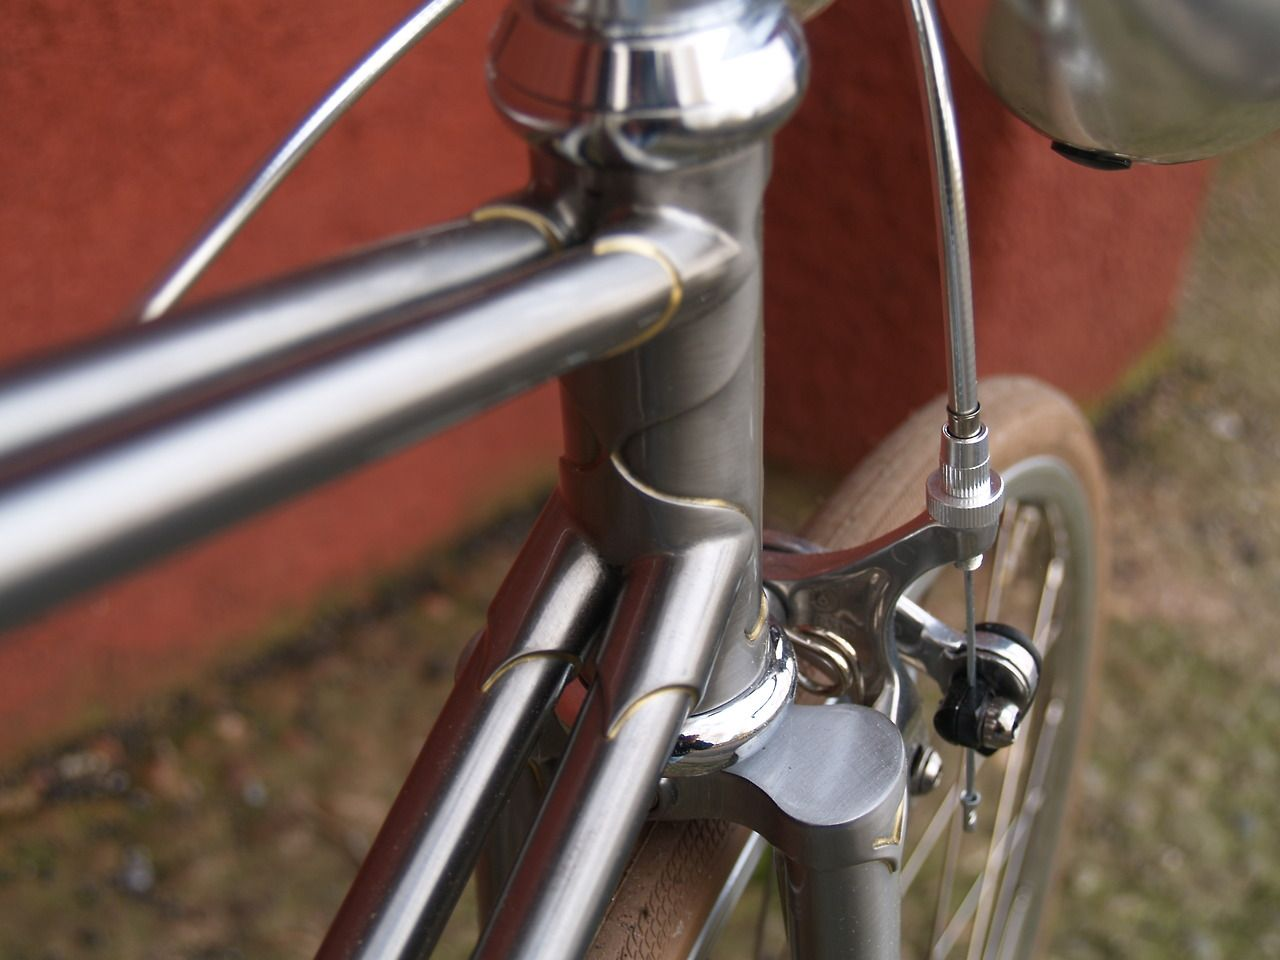 mooie fiets 4